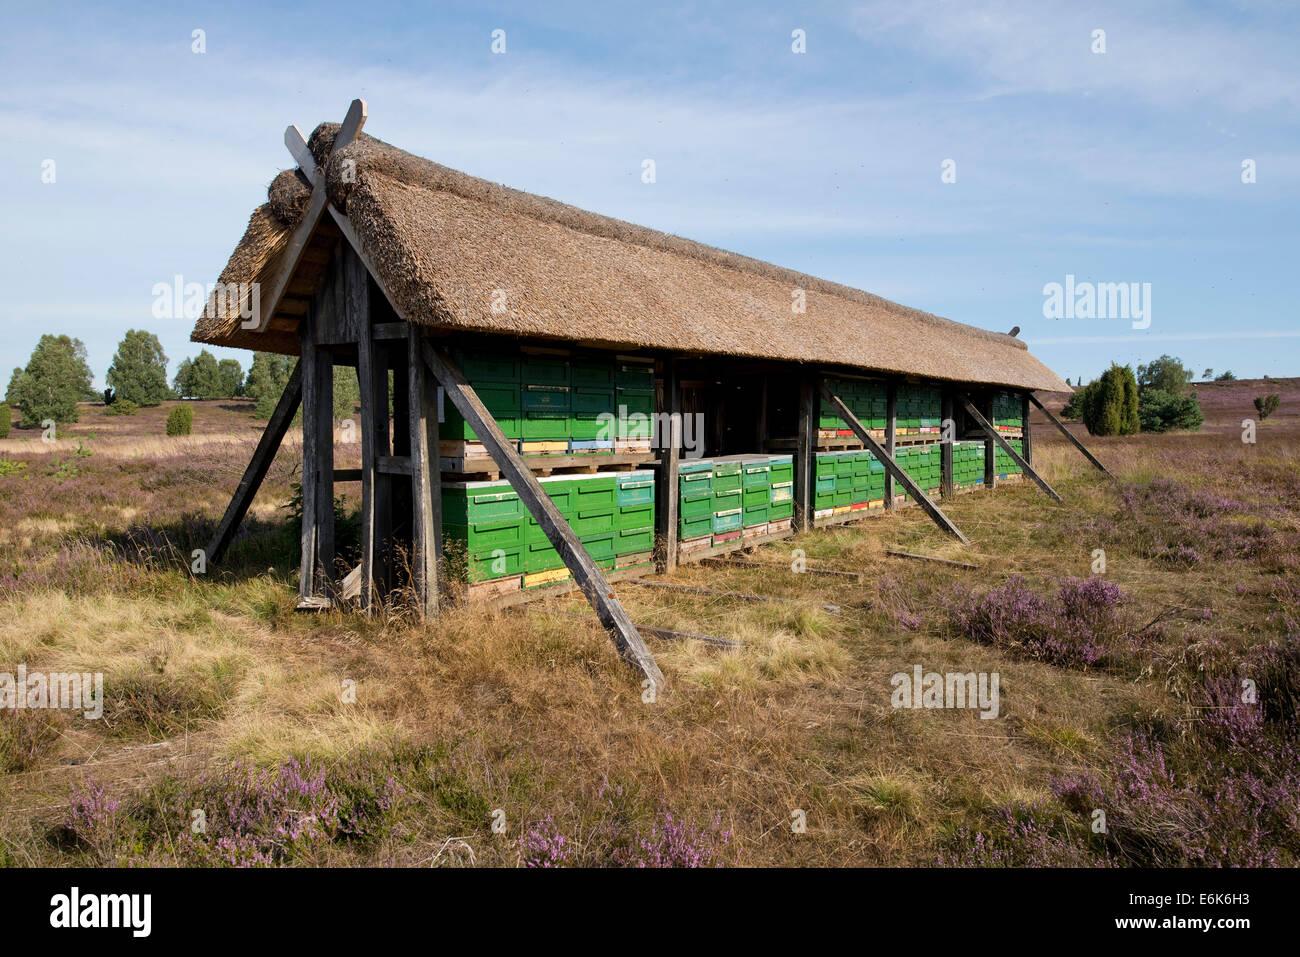 Apiary, Wilsede, Lüneburg Heath Nature Park, Lower Saxony, Germany - Stock Image